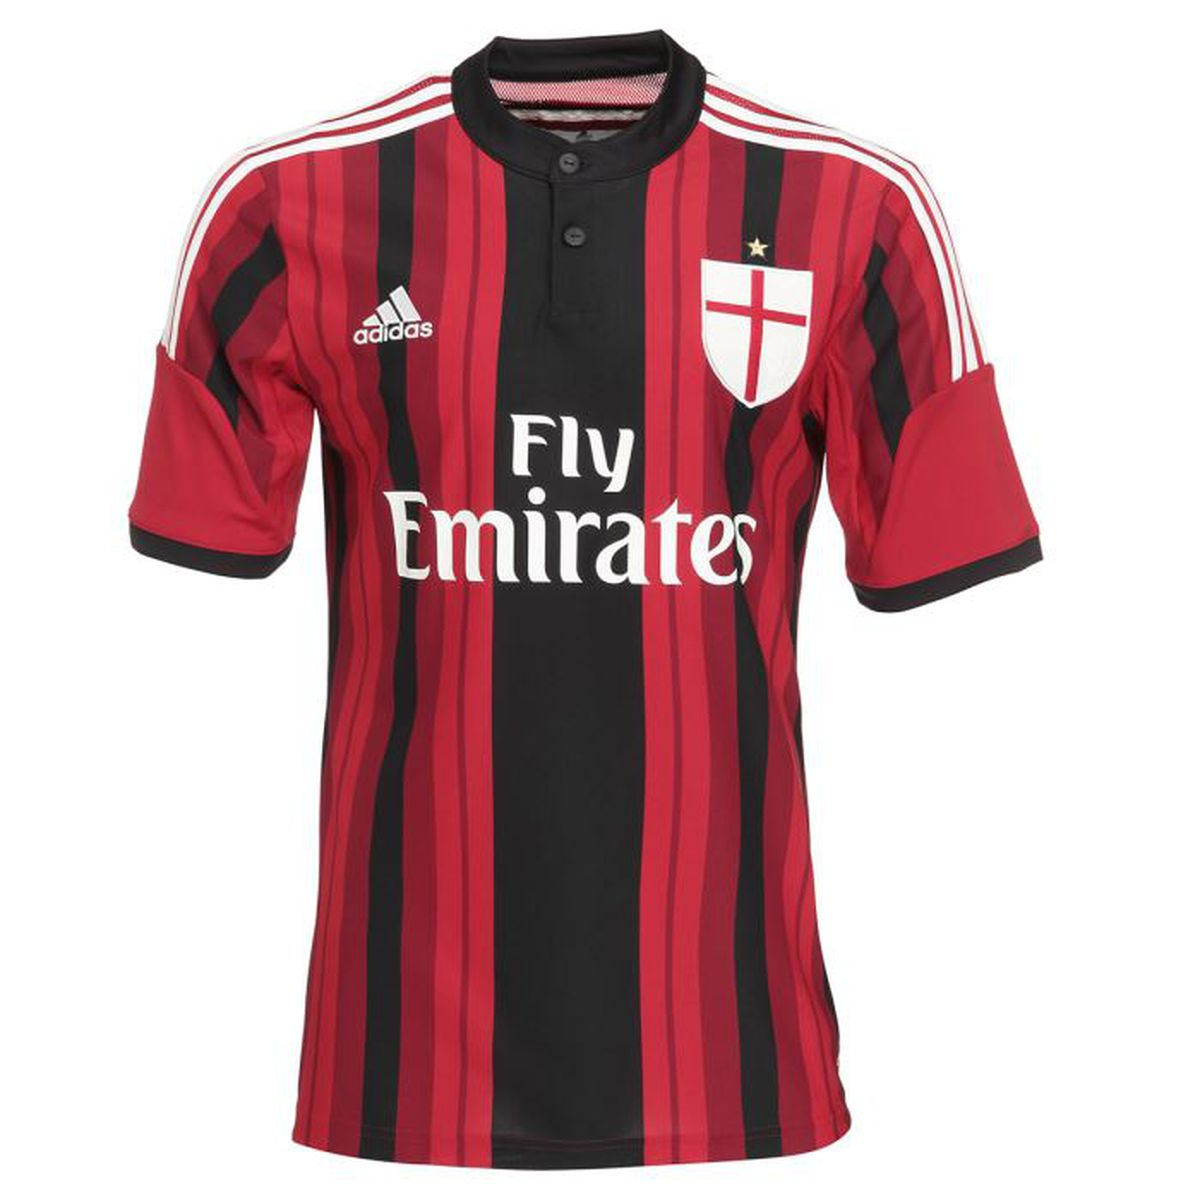 finest selection 49fb6 d3b34 ADIDAS Maillot Domicile AC Milan Homme